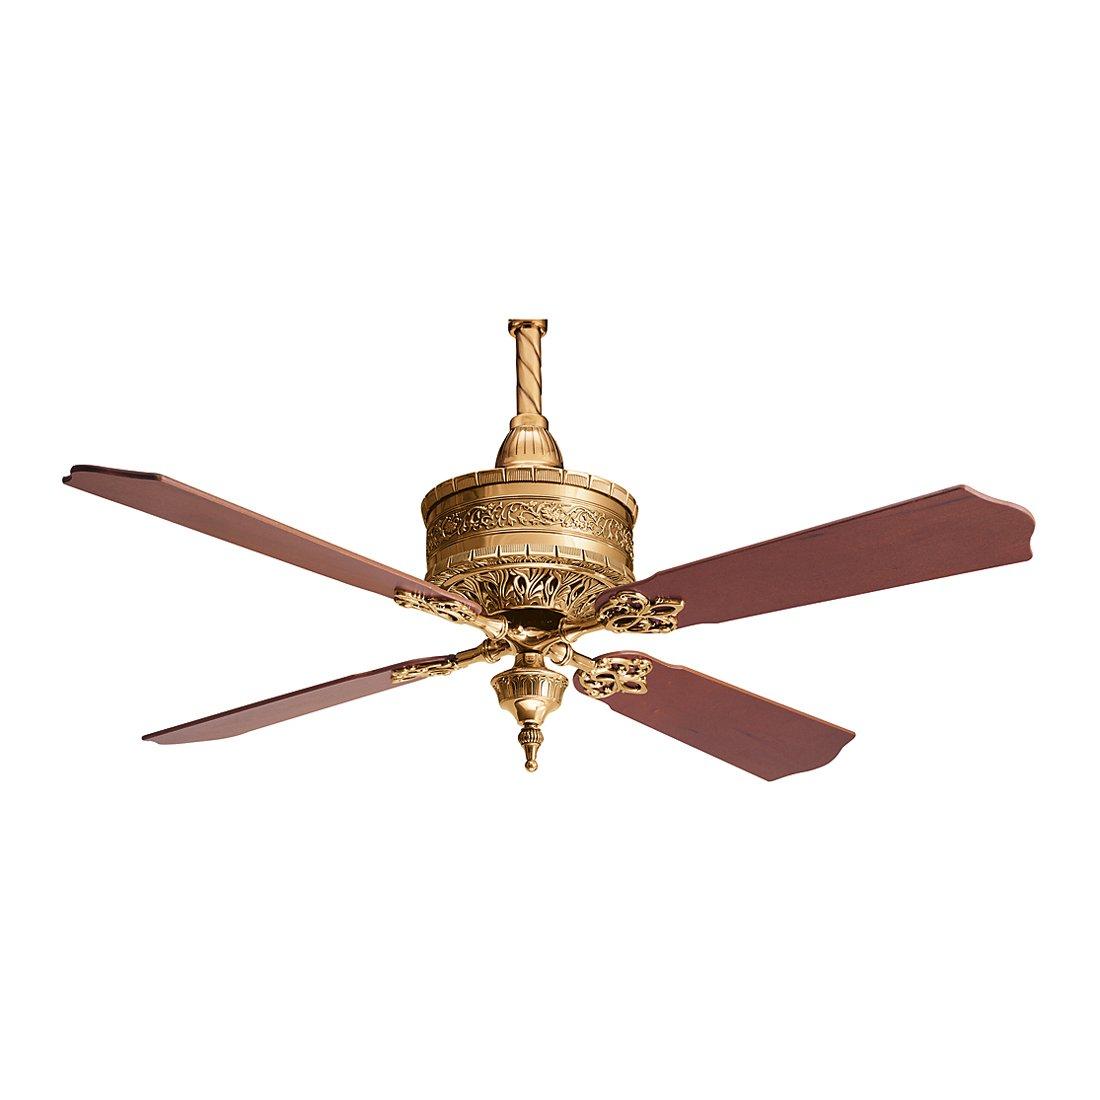 casablanca 19th century ceiling fan photo - 1